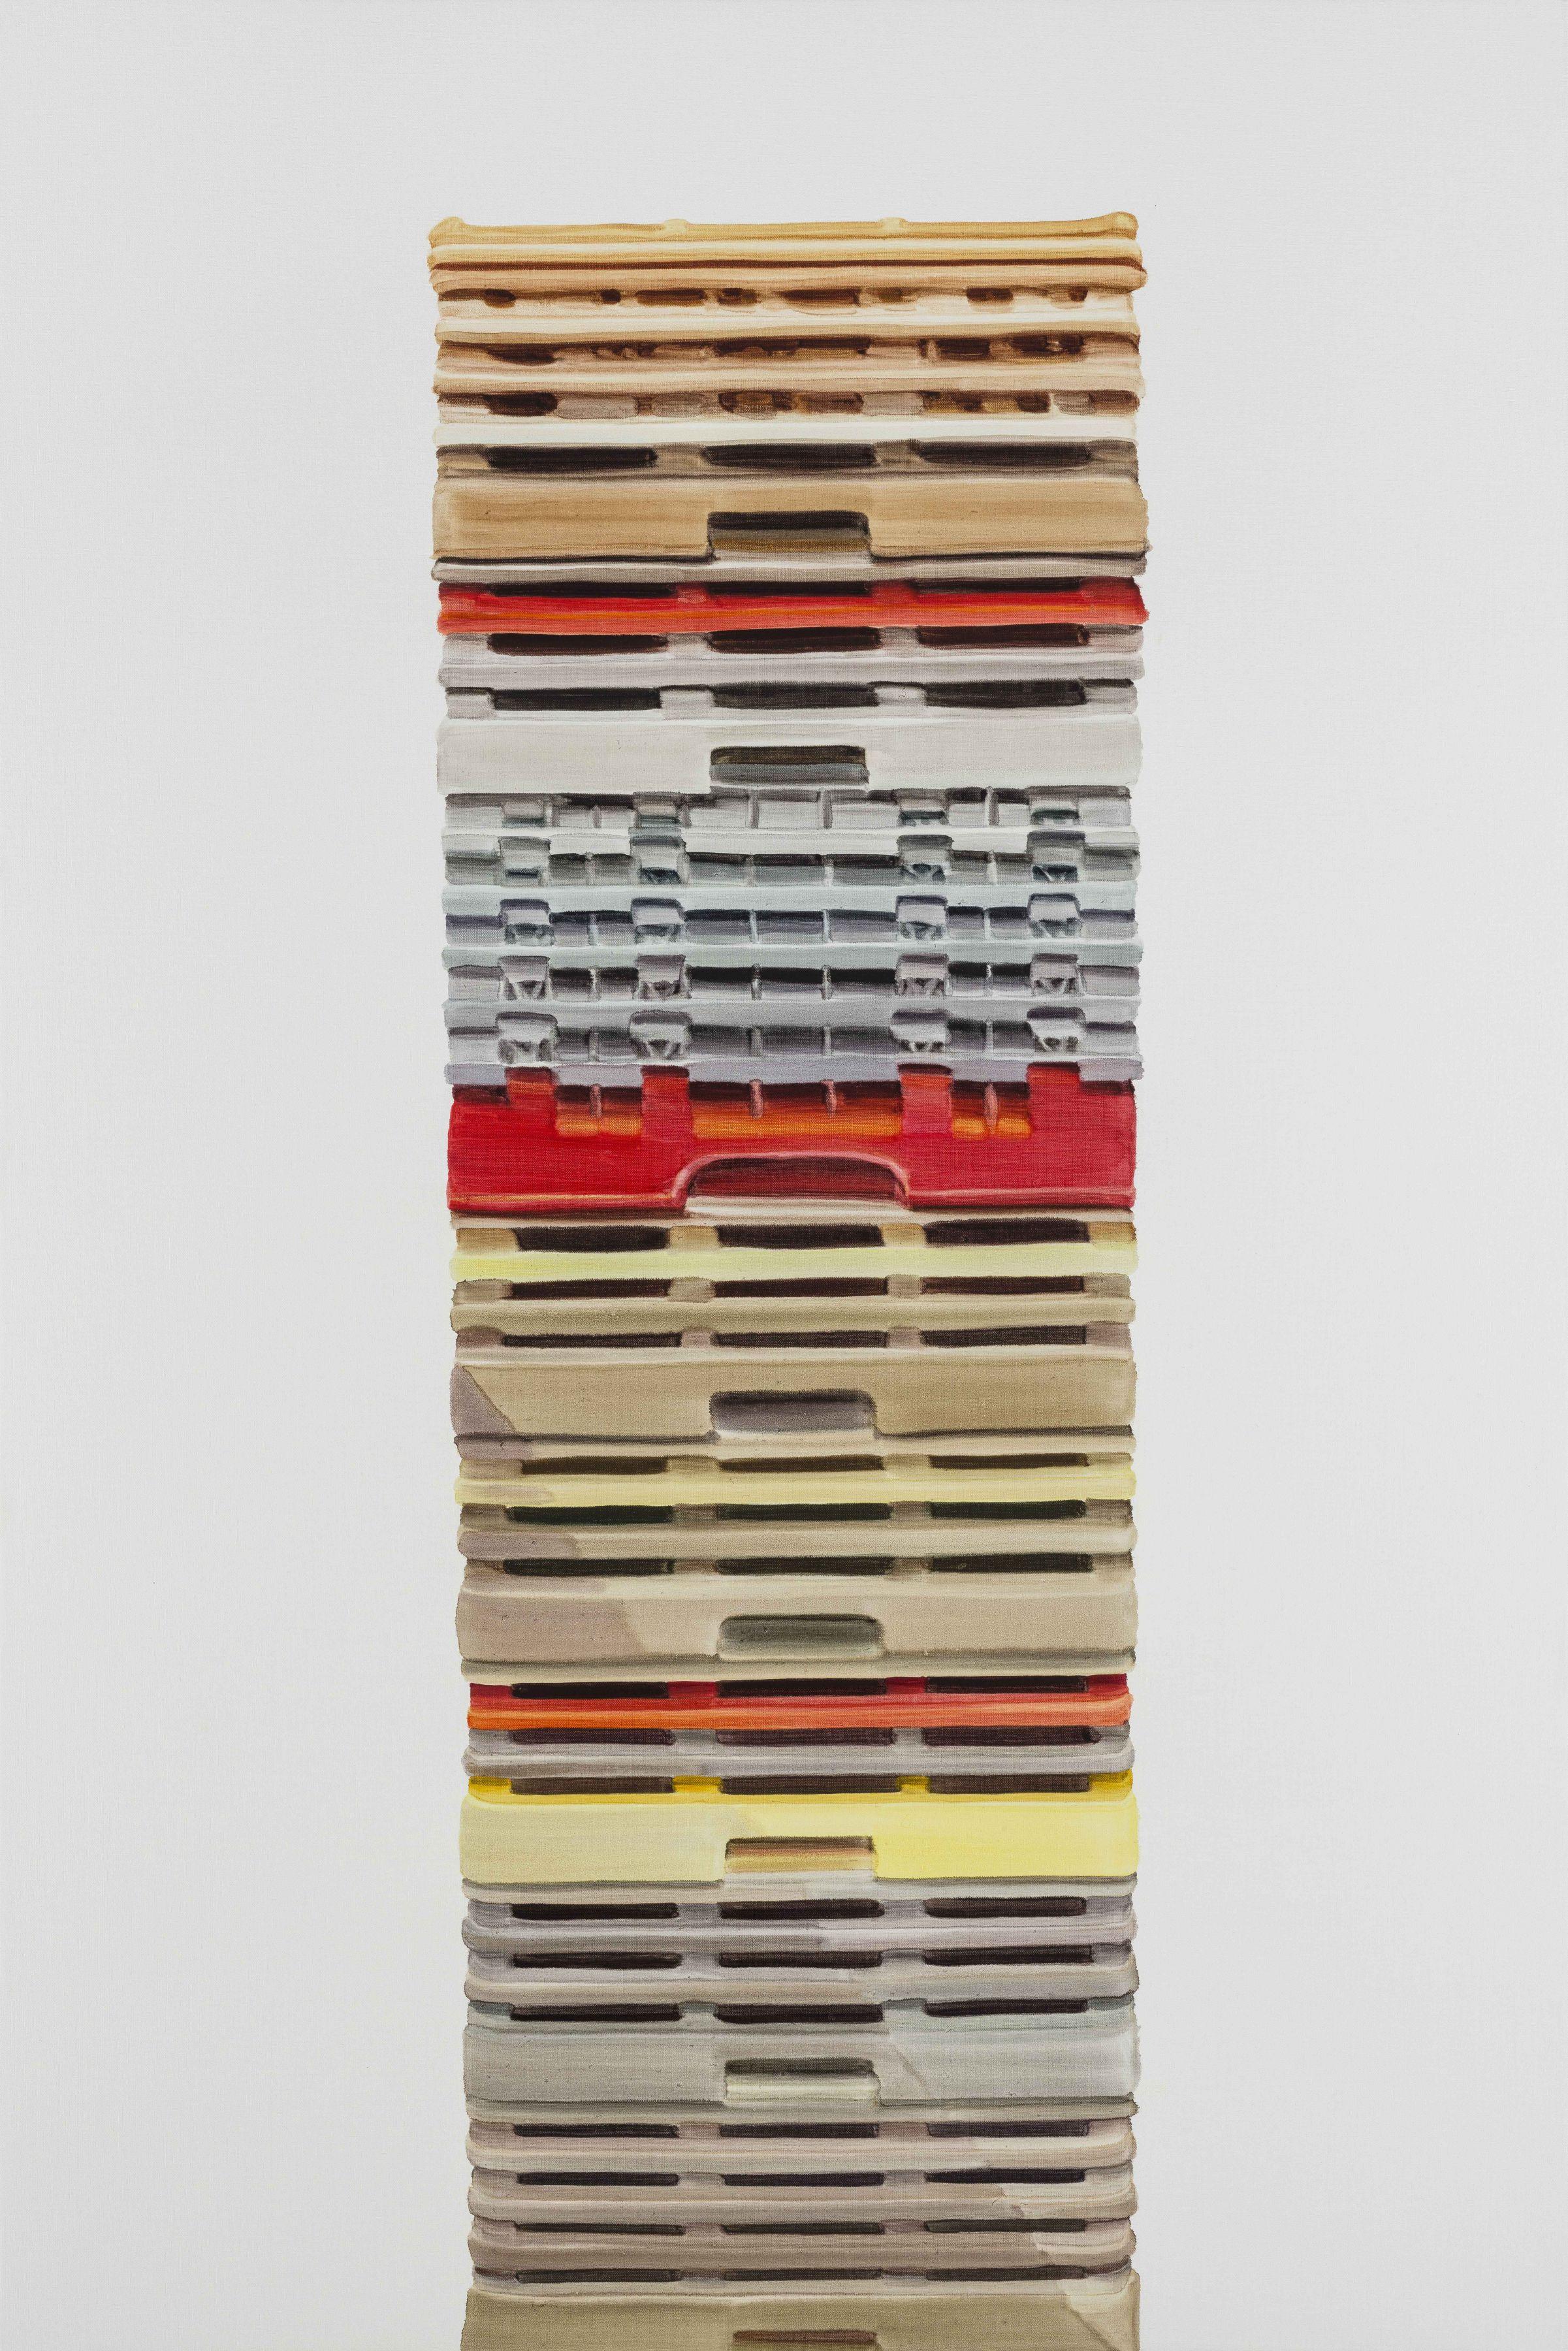 Guo Hongwei 郭鸿蔚 (b. 1982), Storeys 楼